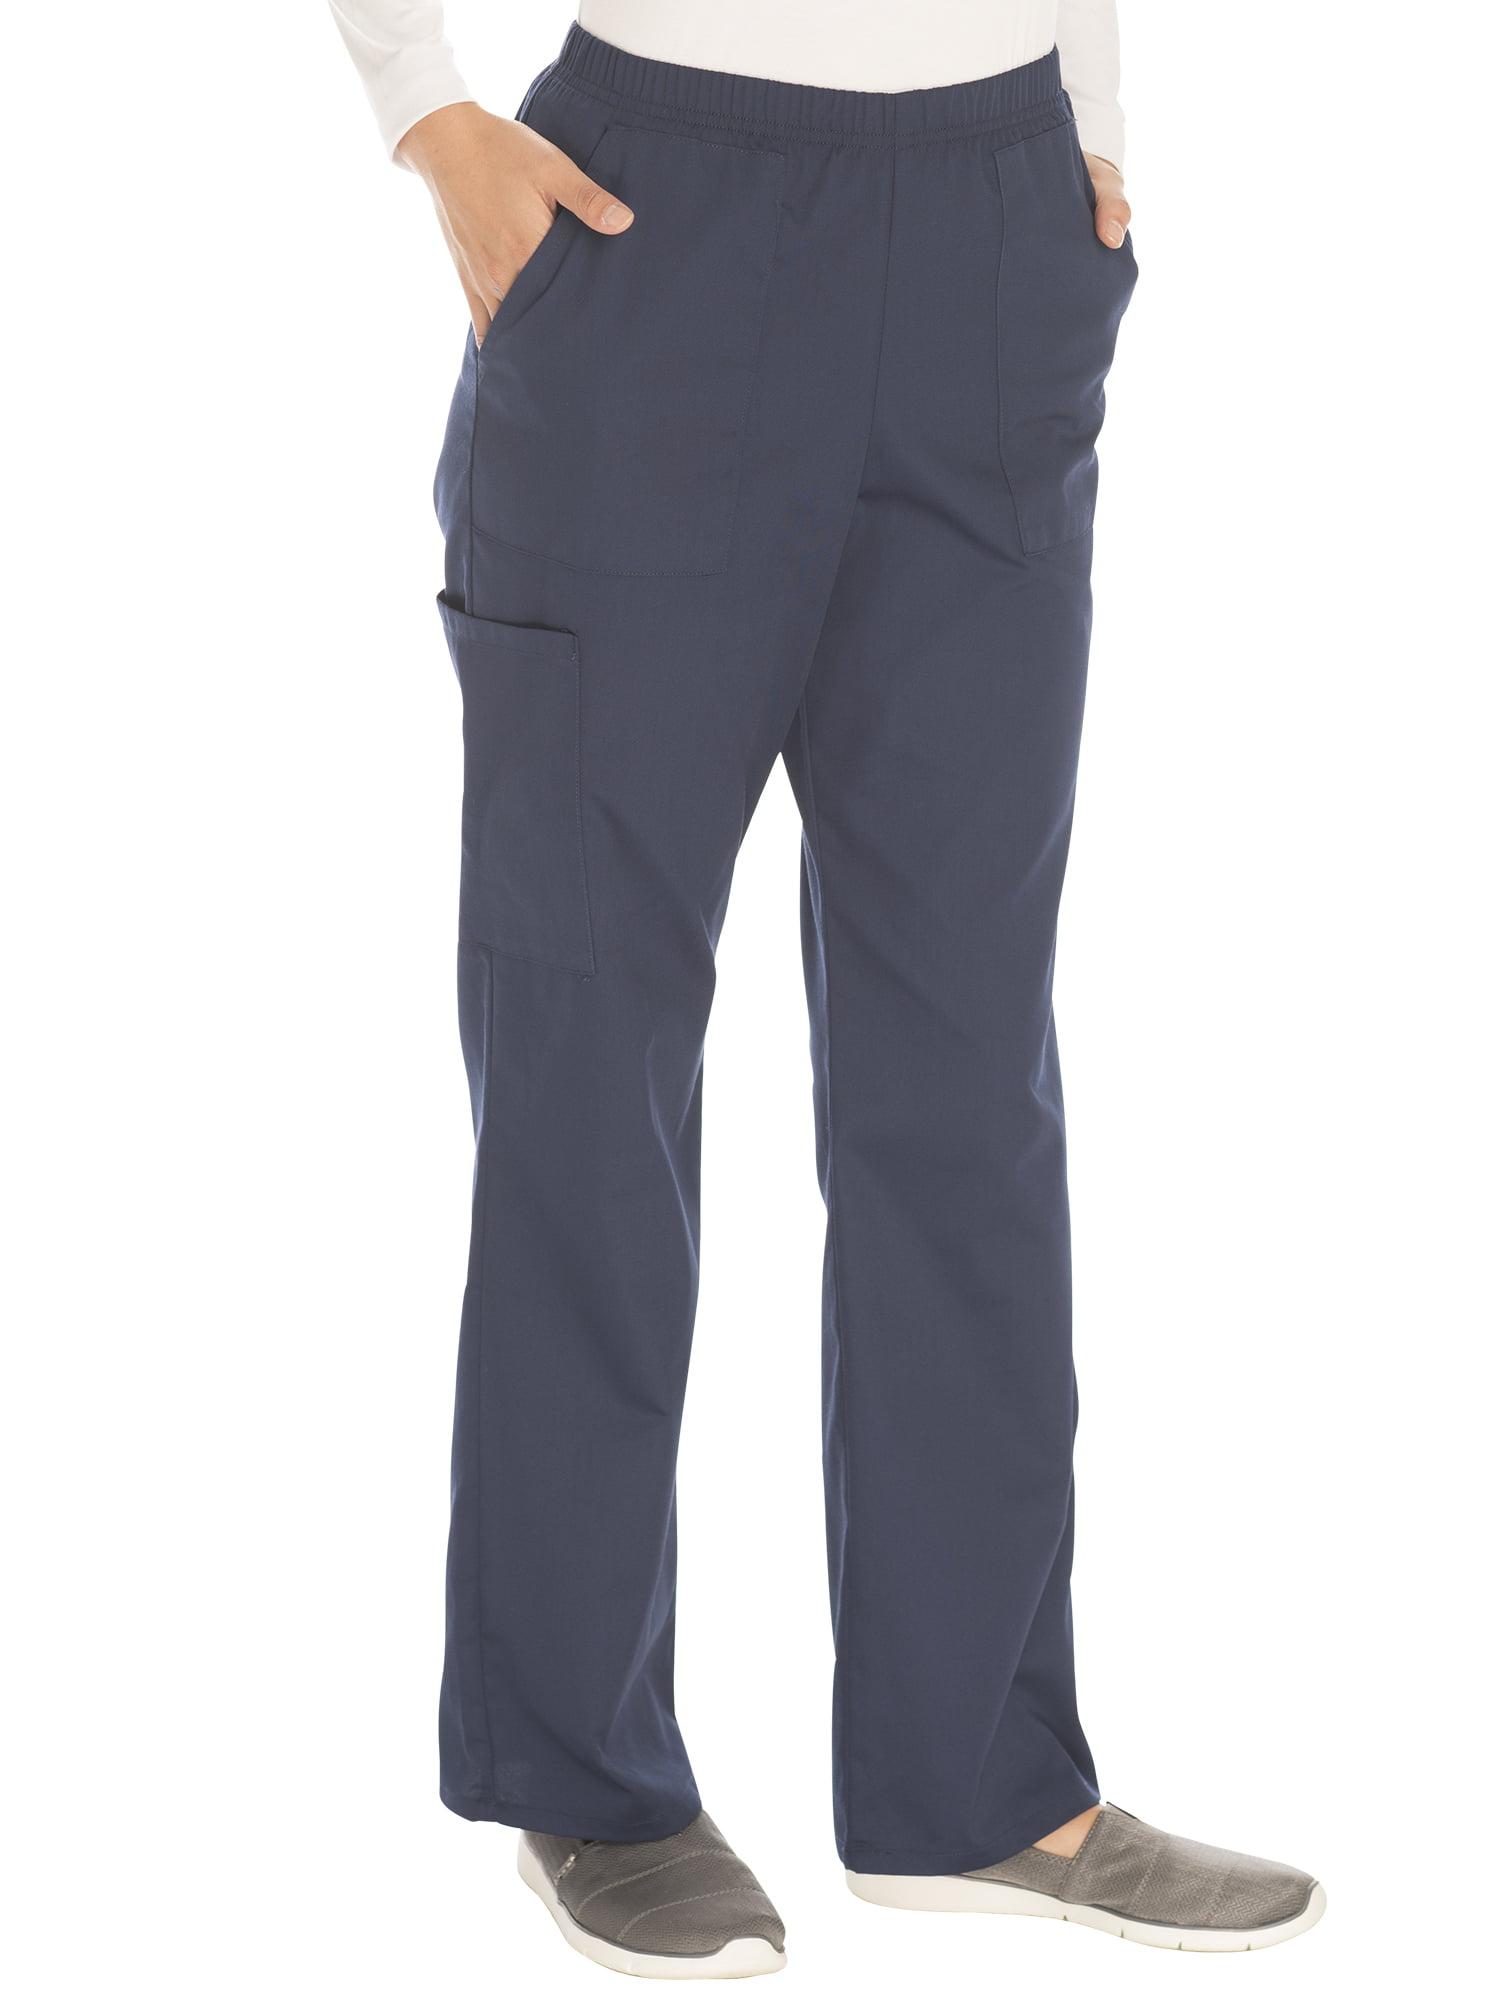 Scrubstar Women's Petite Core Essentials Mechanical Stretch Pull On Scrub Pant